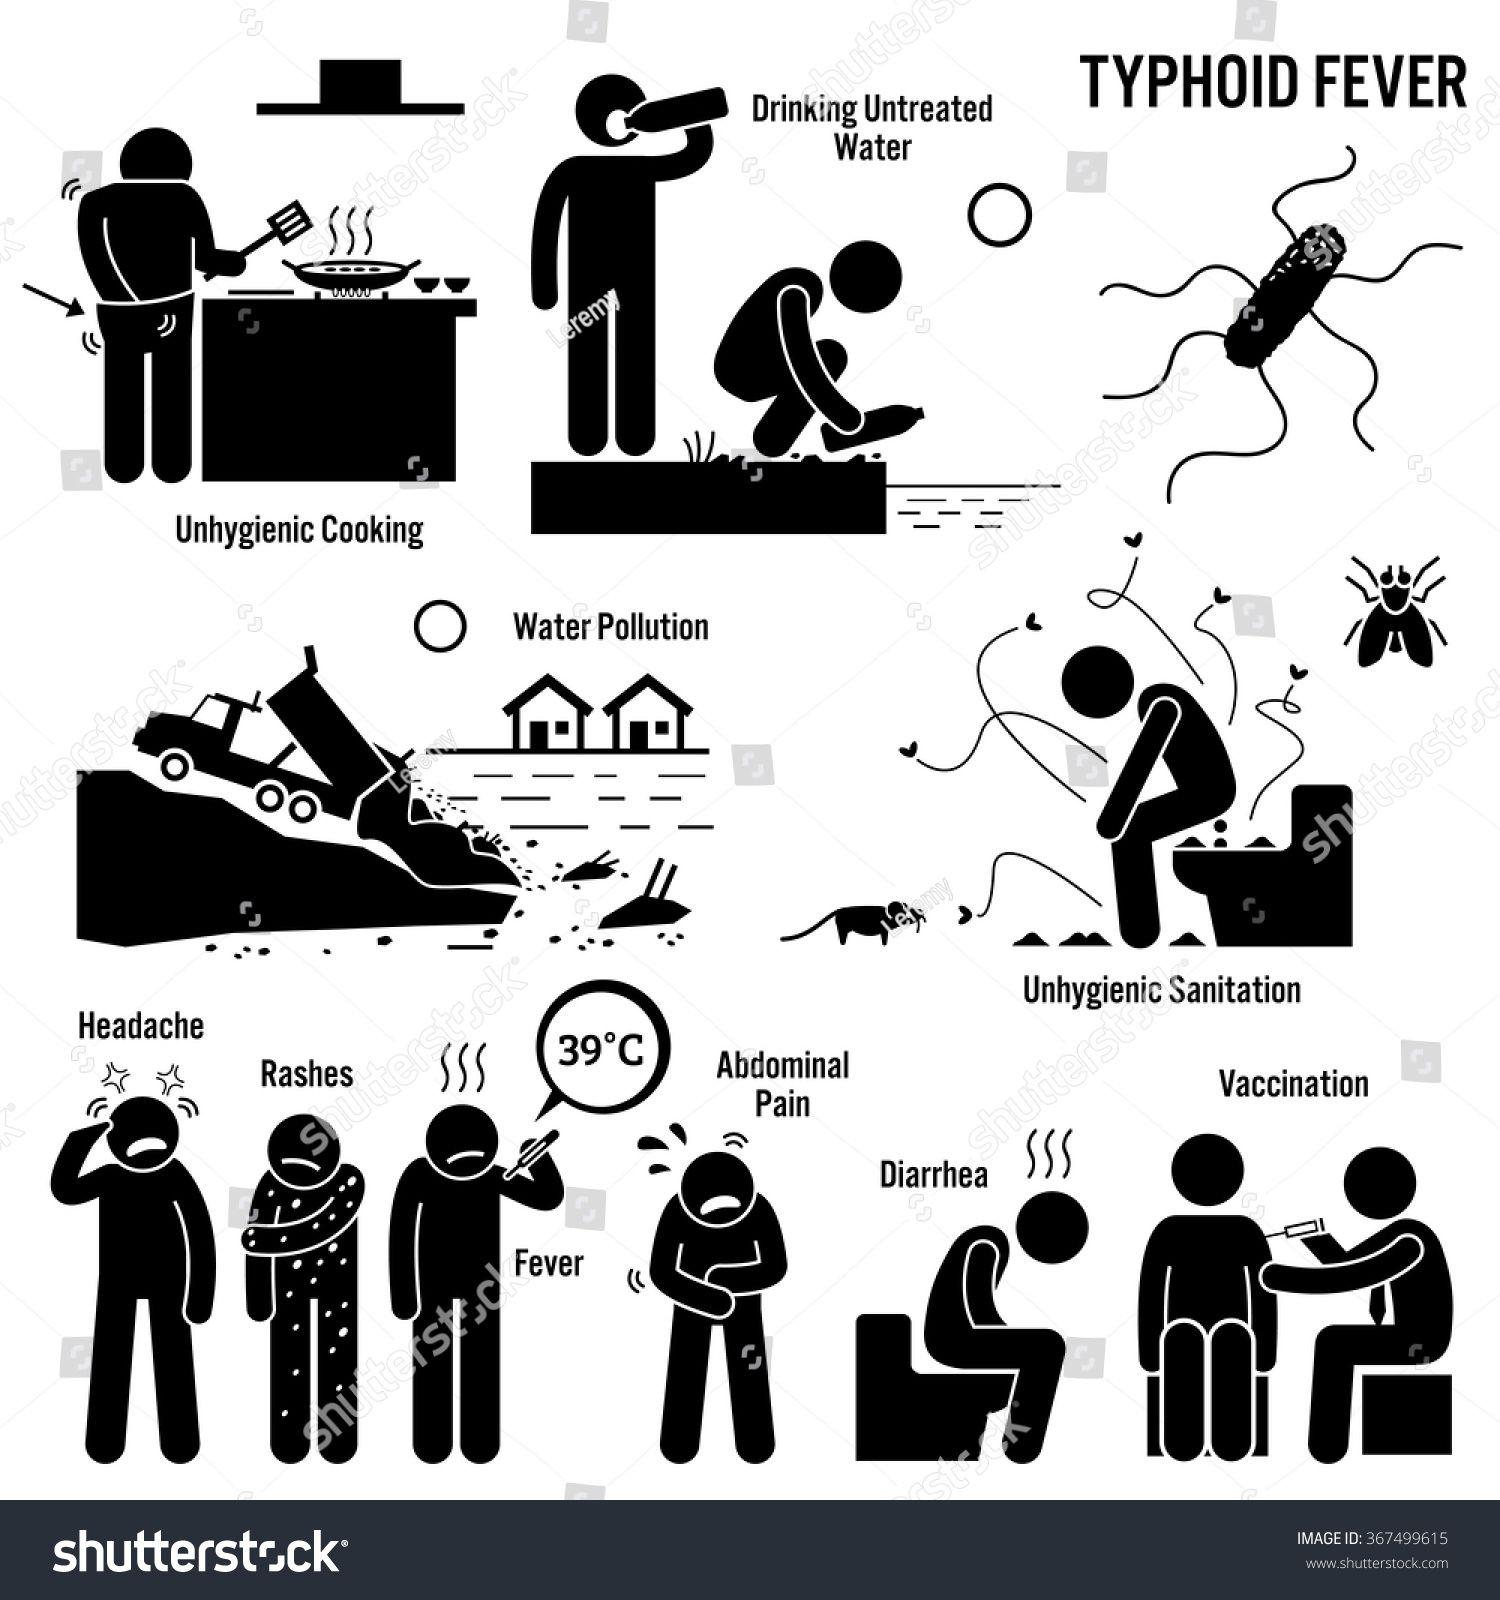 Typhoid Fever Unhygienic Lifestyle Poor Sanitation Stick Figure